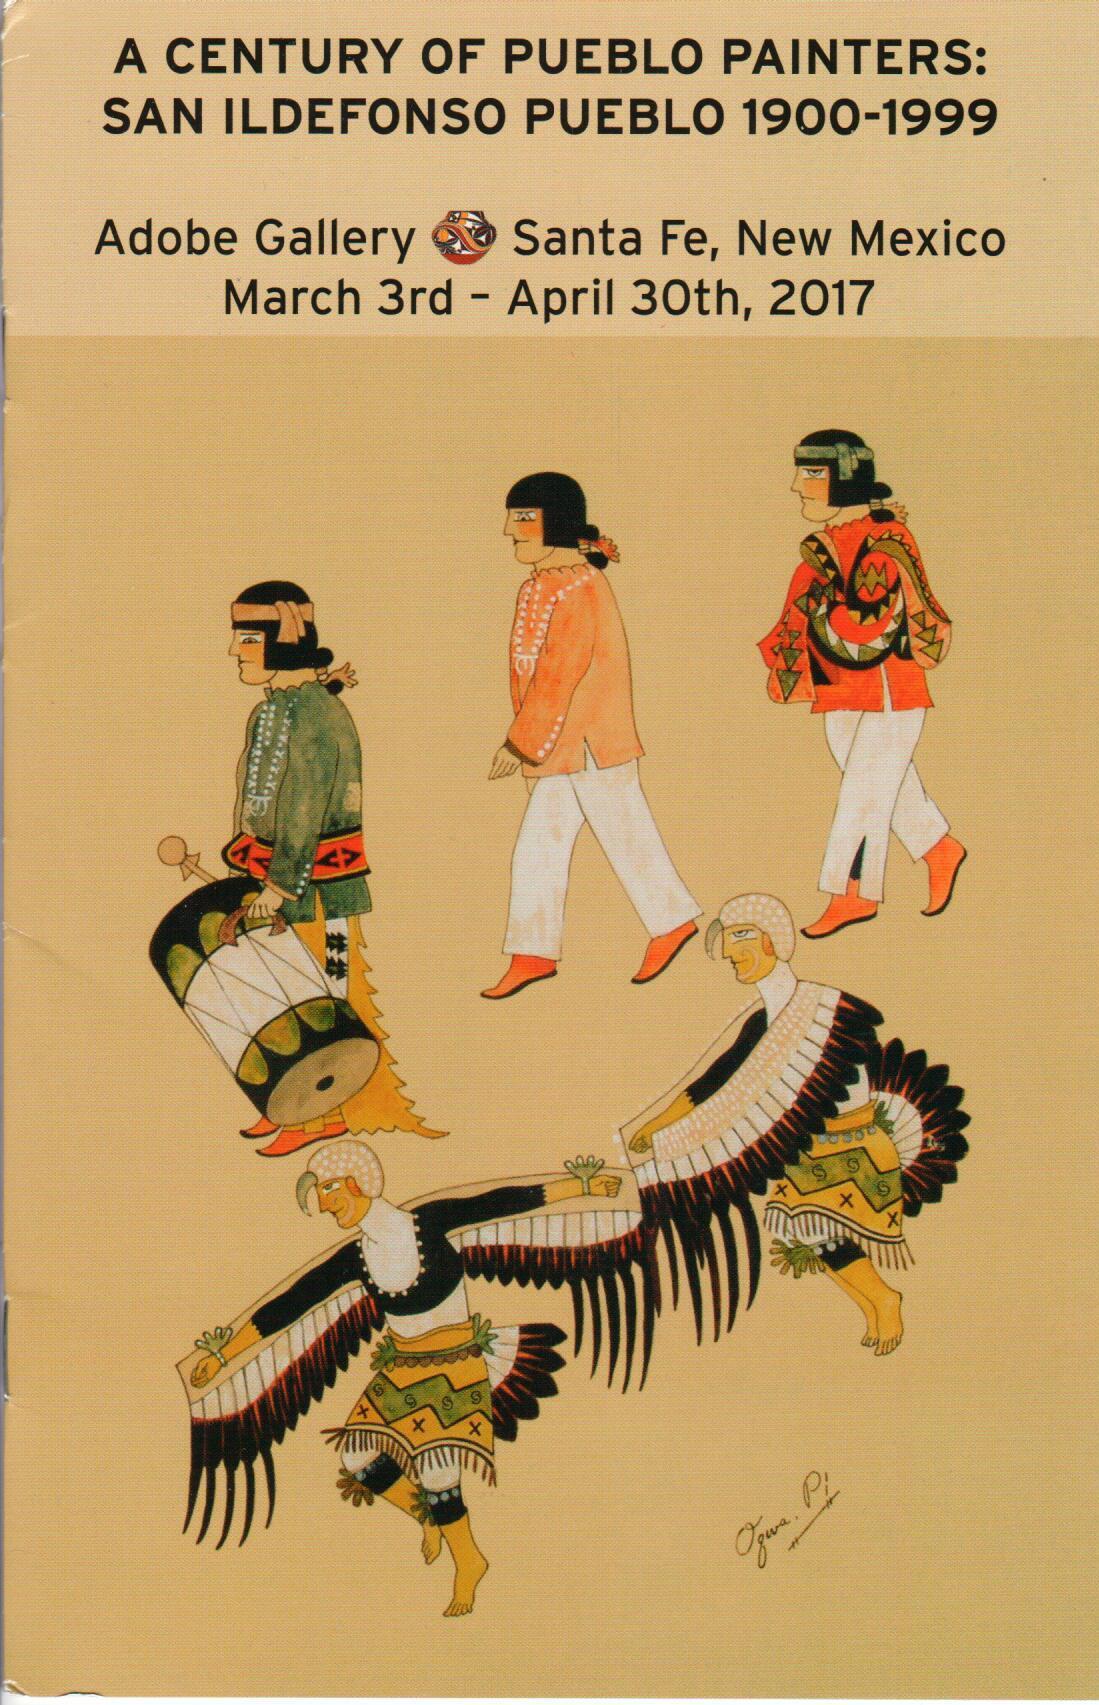 Adobe Gallery's Show A Century of Pueblo Painters: San Ildefonso Pueblo 1900-1999